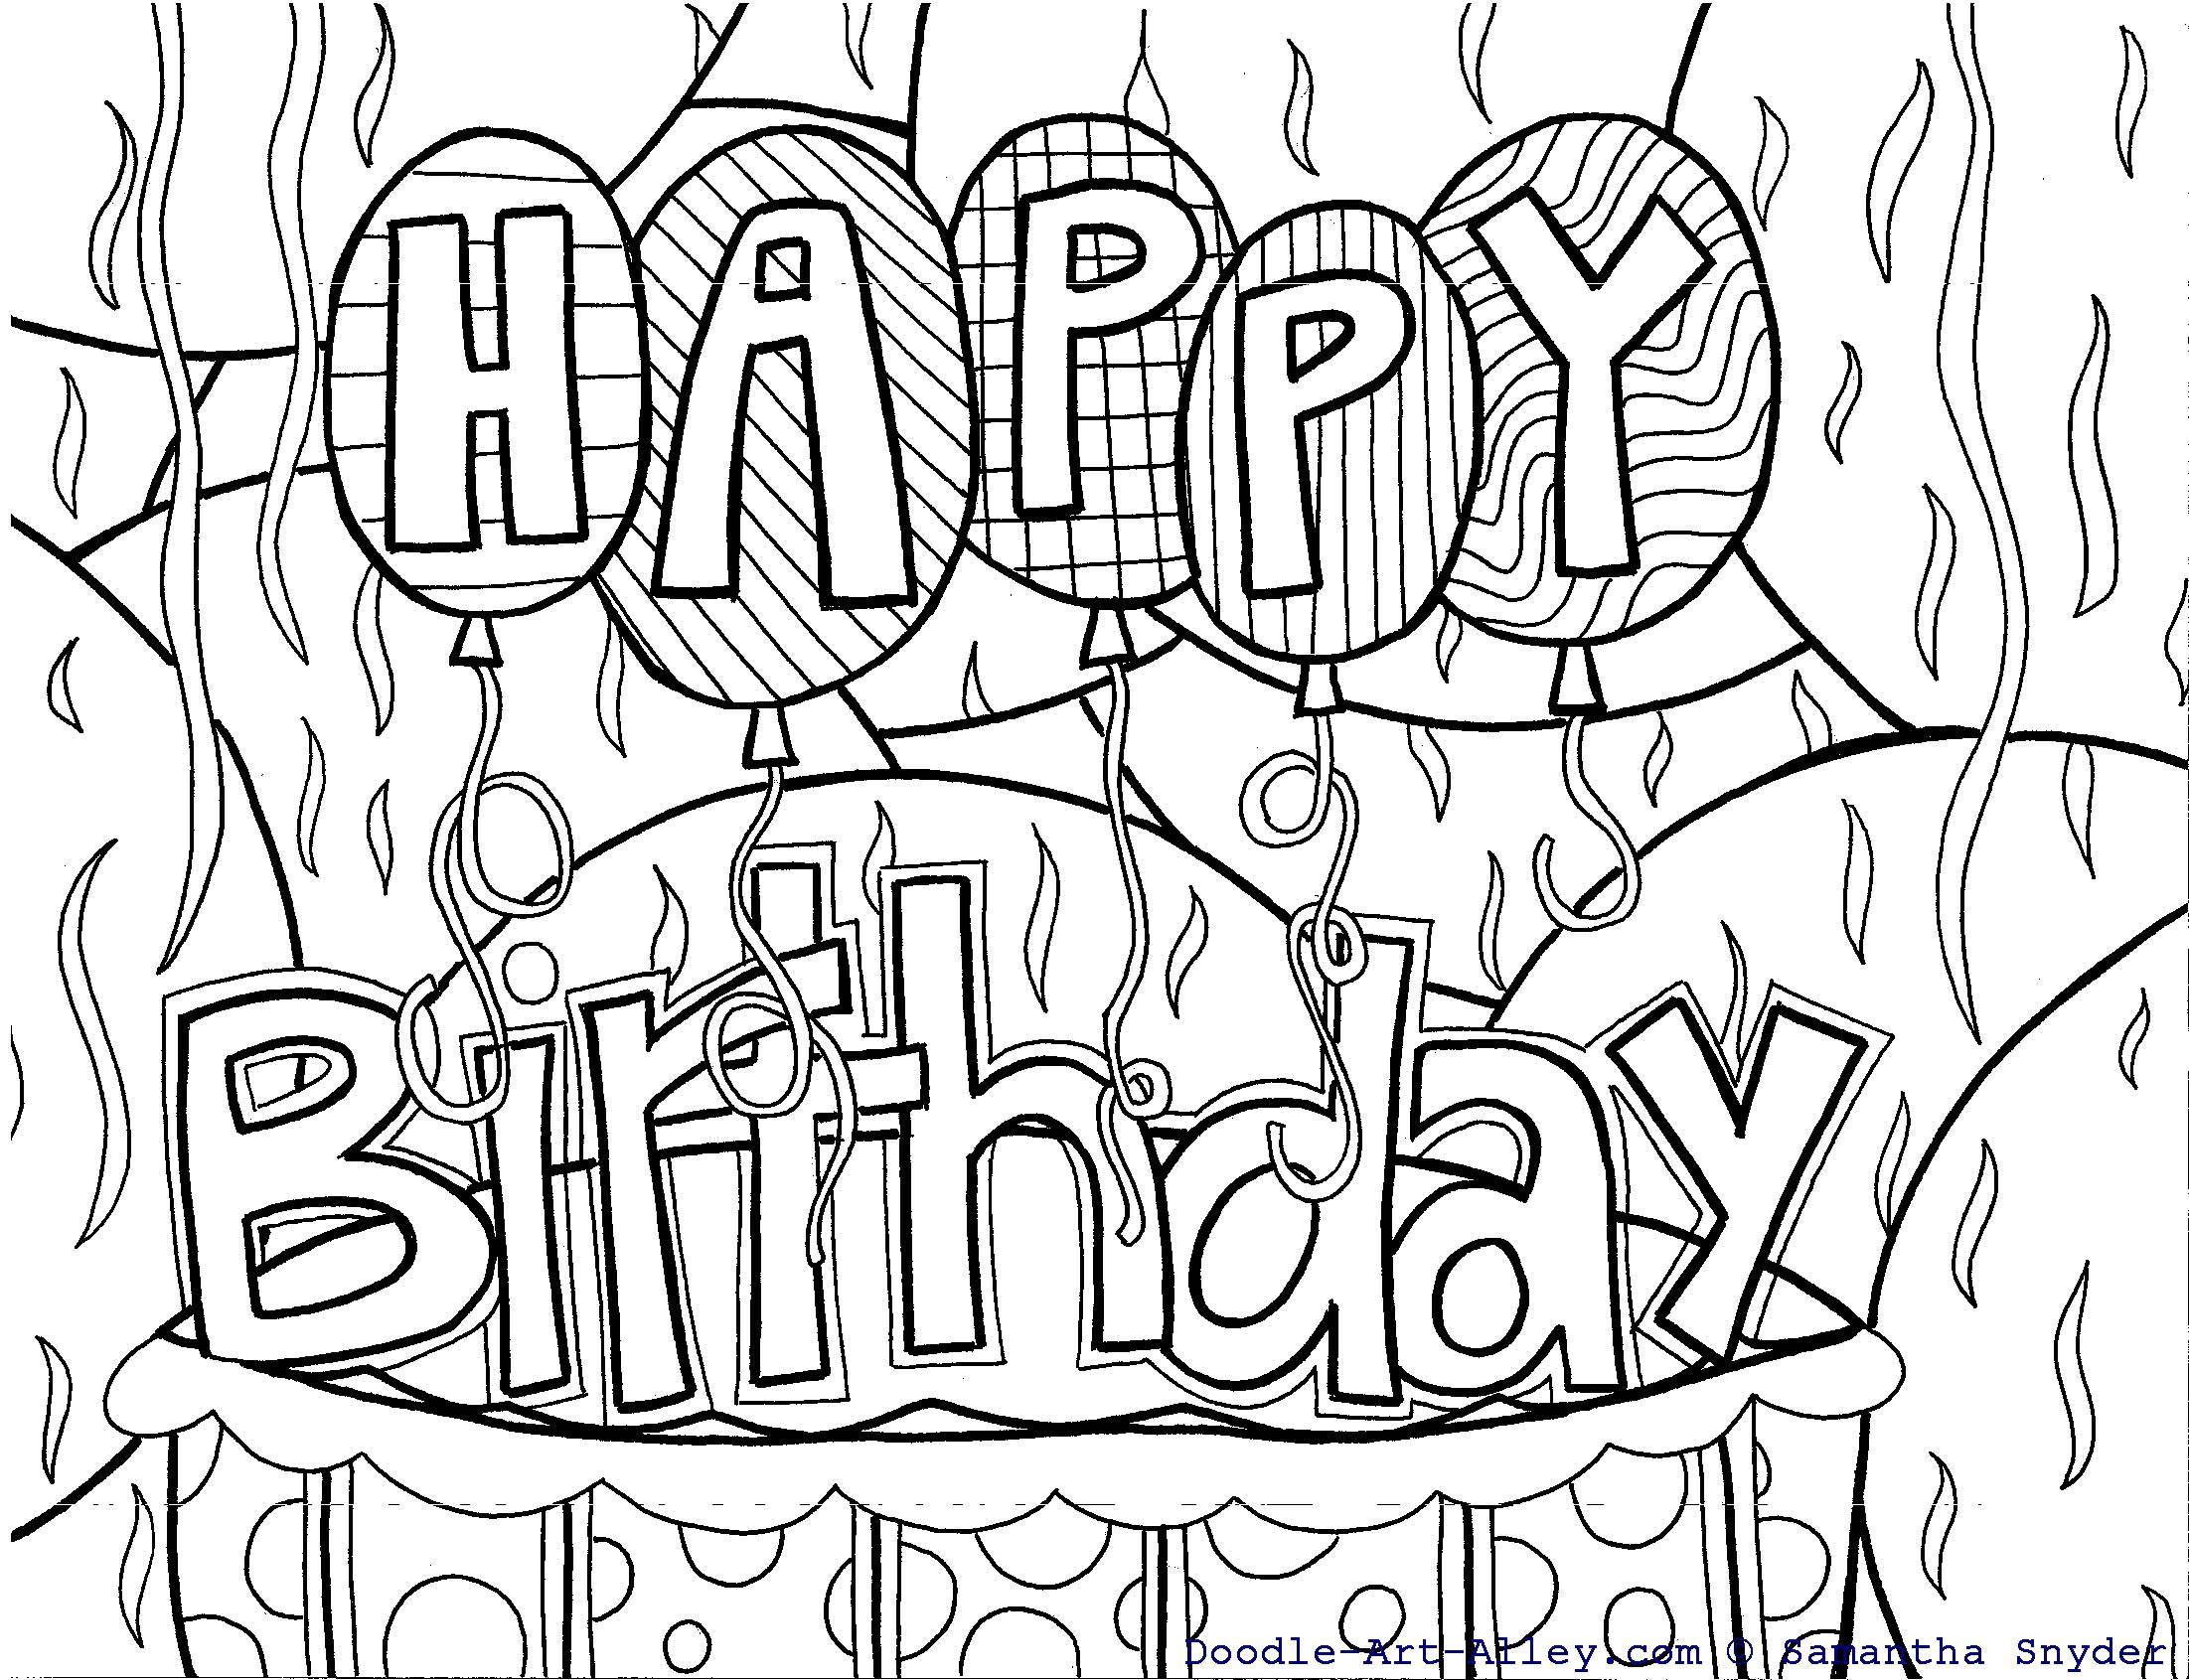 Happybirthday Doodle Art Alley